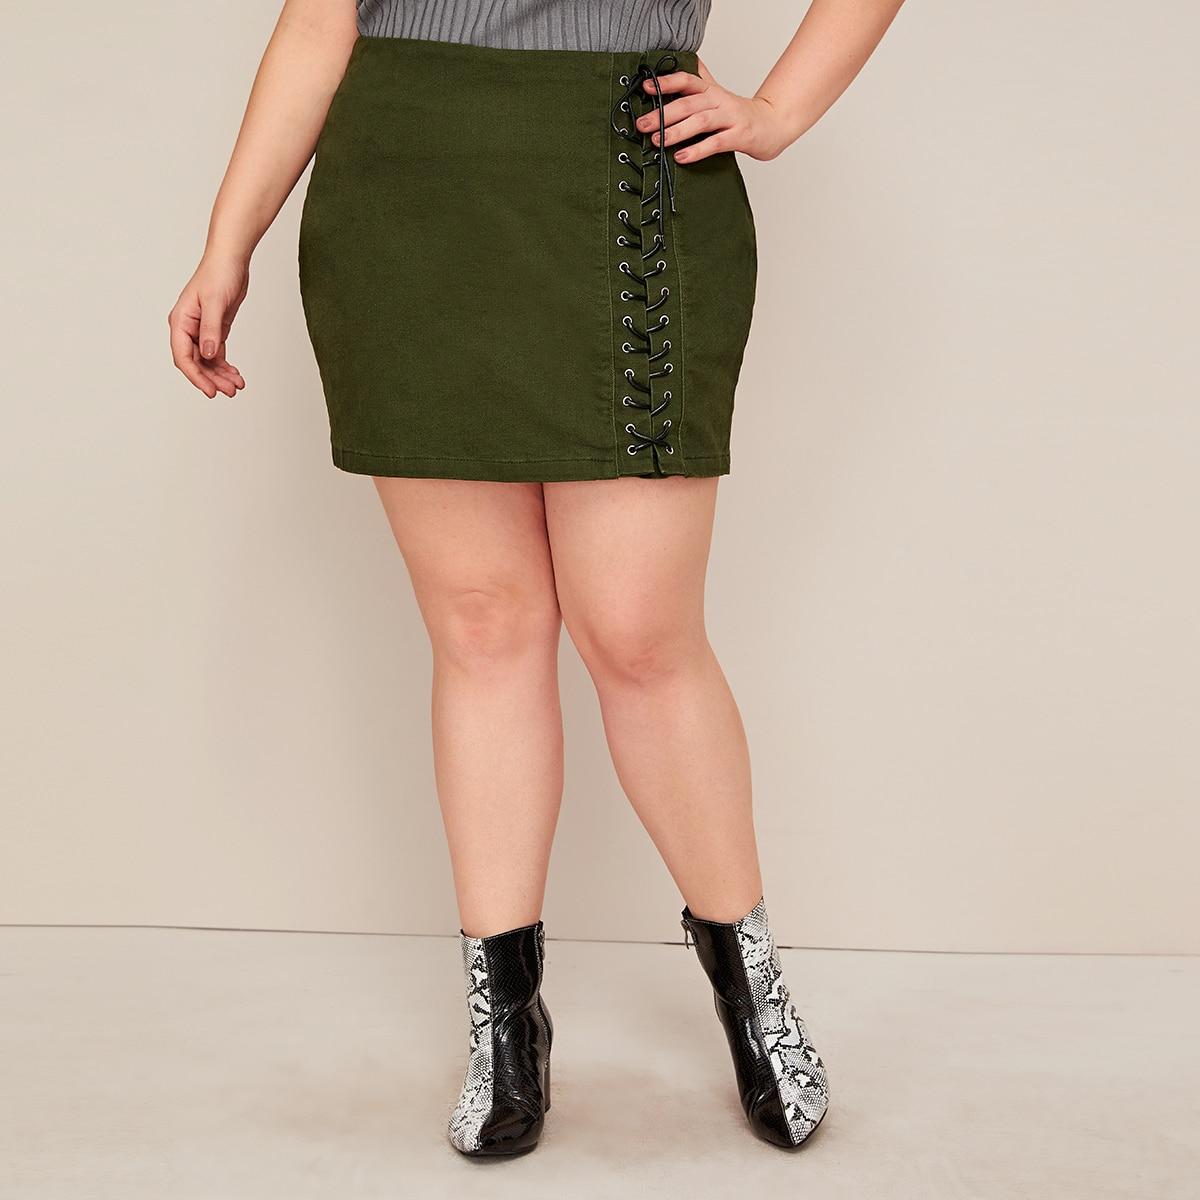 Leger groen Casual Vlak Grote maten: jeansrokken Kant